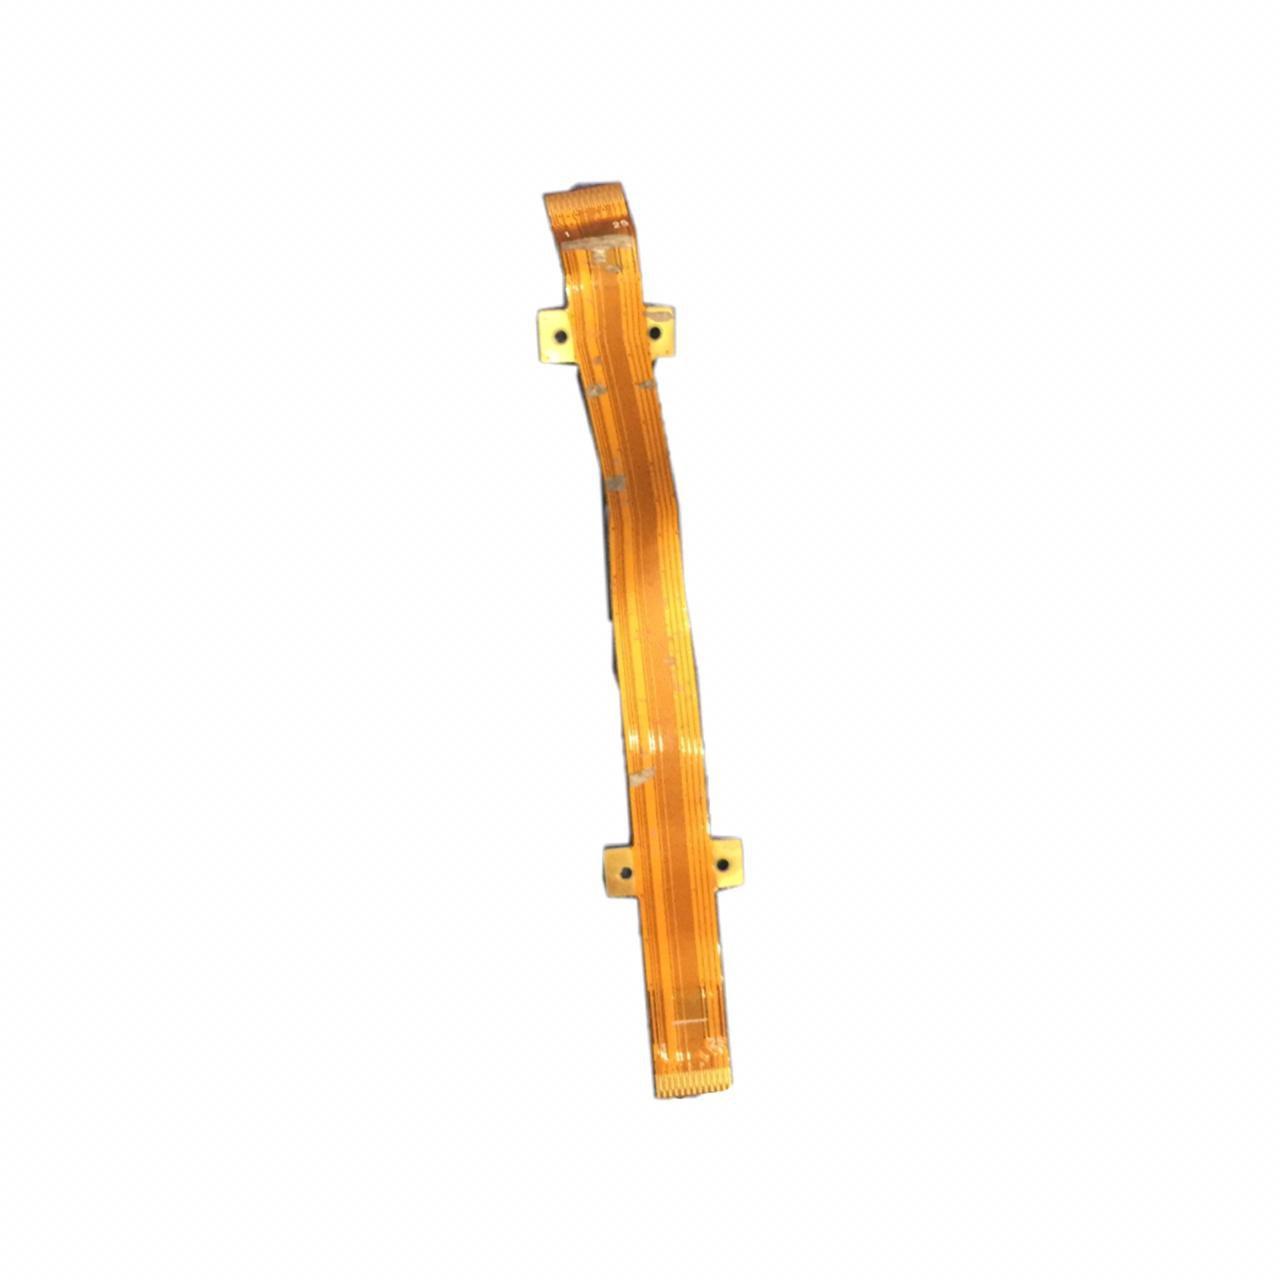 CABO FLEX PRINCIPAL 5124J 5101J TCL L10 L9 PLUS